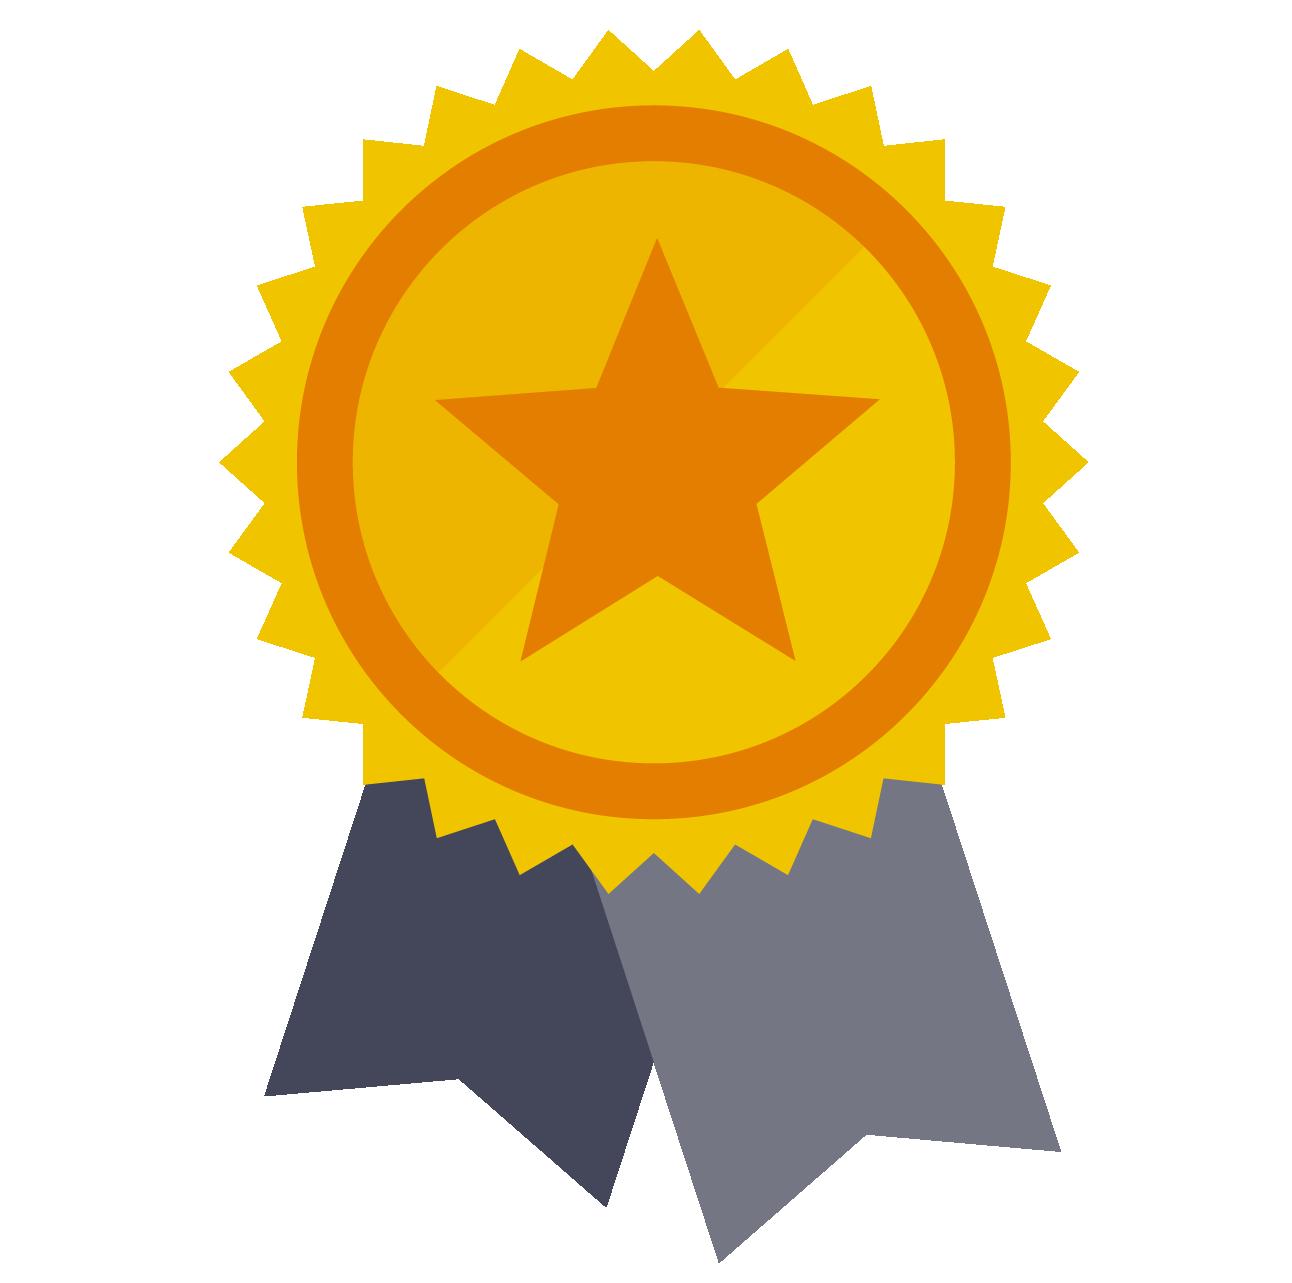 Travel Insurance Star Ratings and Award